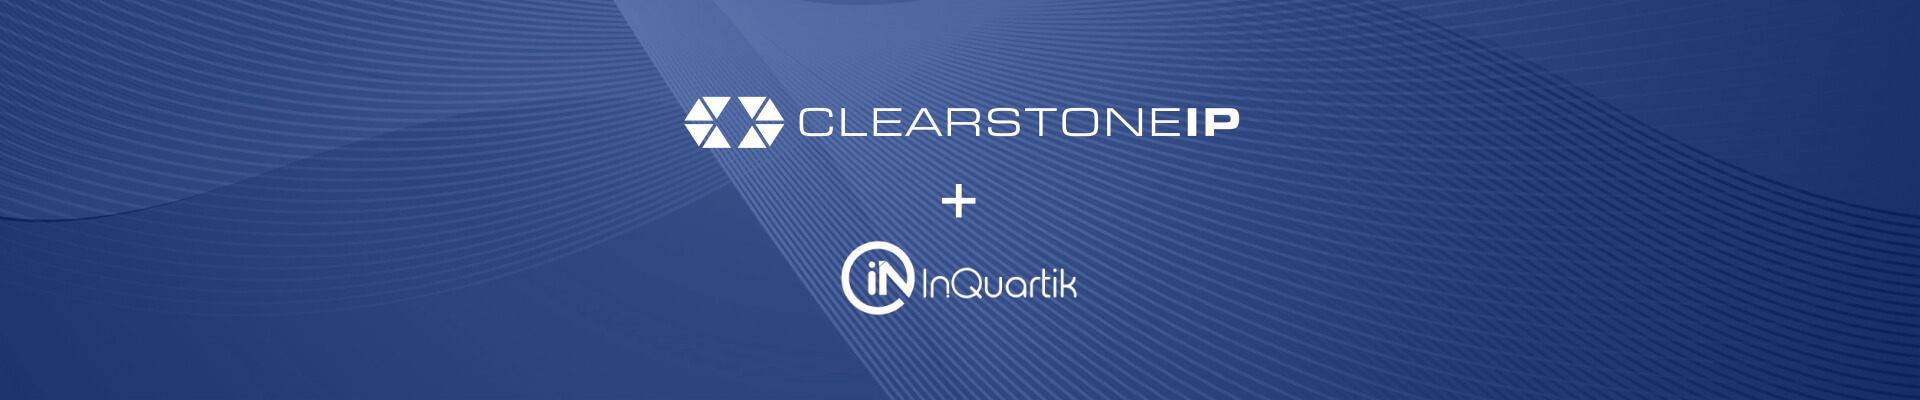 ClearstoneIPとInQuartikが業務提携を発表- 「Clearstone FTO」と「Patentcloud」が機能連携:より効率的なFTO調査の実現へ向けて